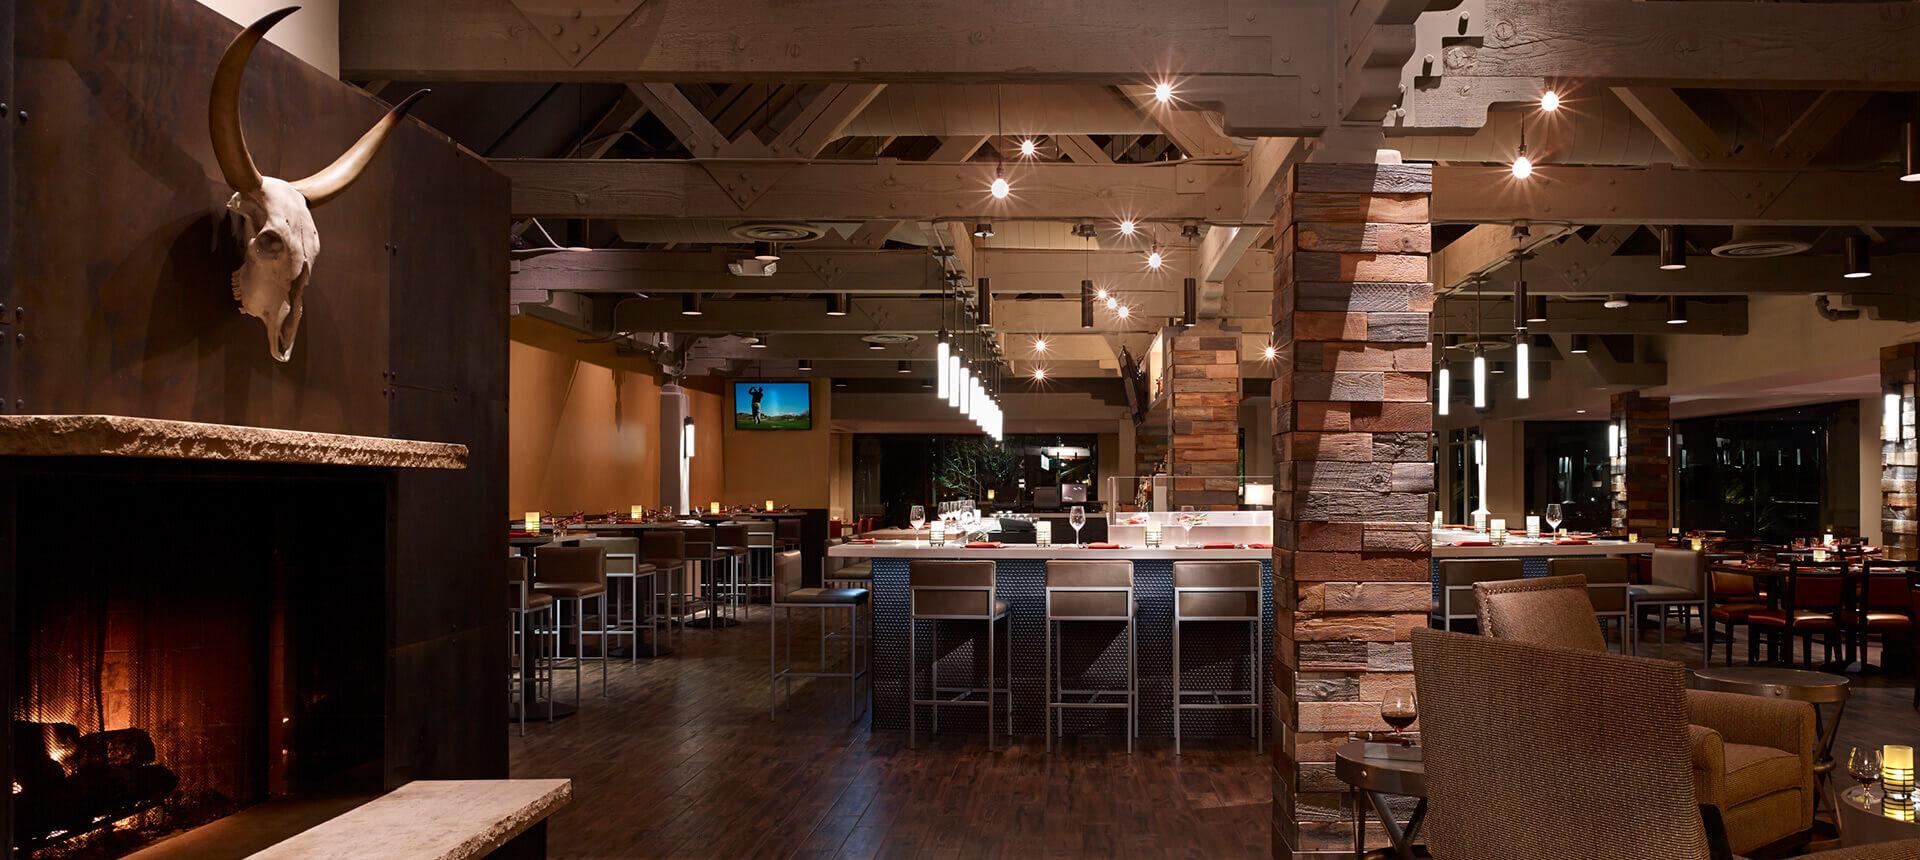 Toro latin restaurant rum bar callisonrtkl